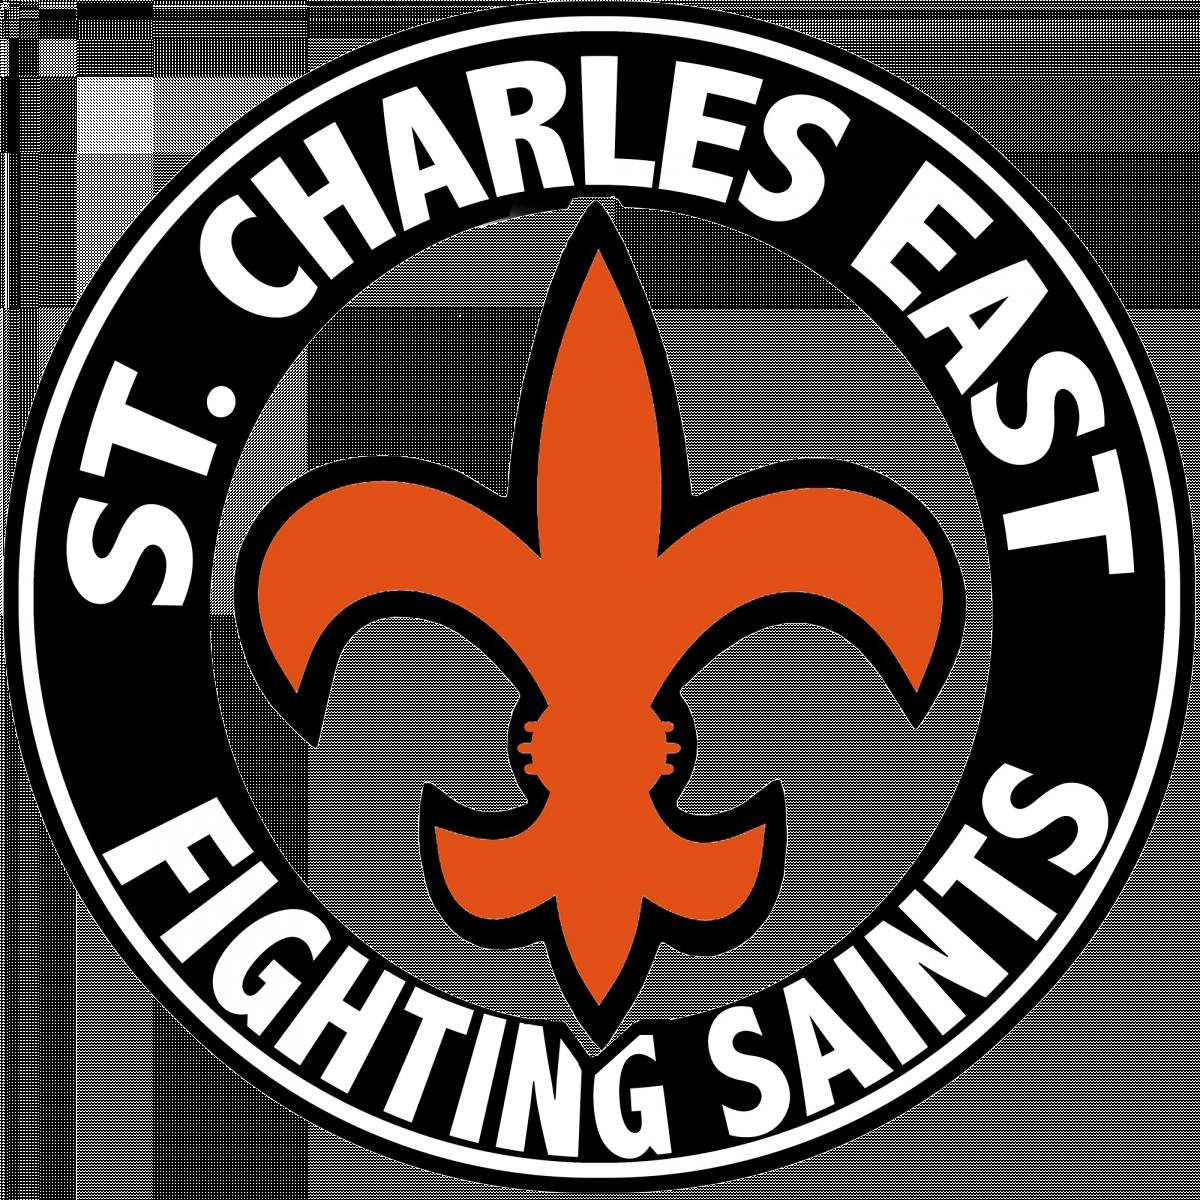 St. Charles East High School logo